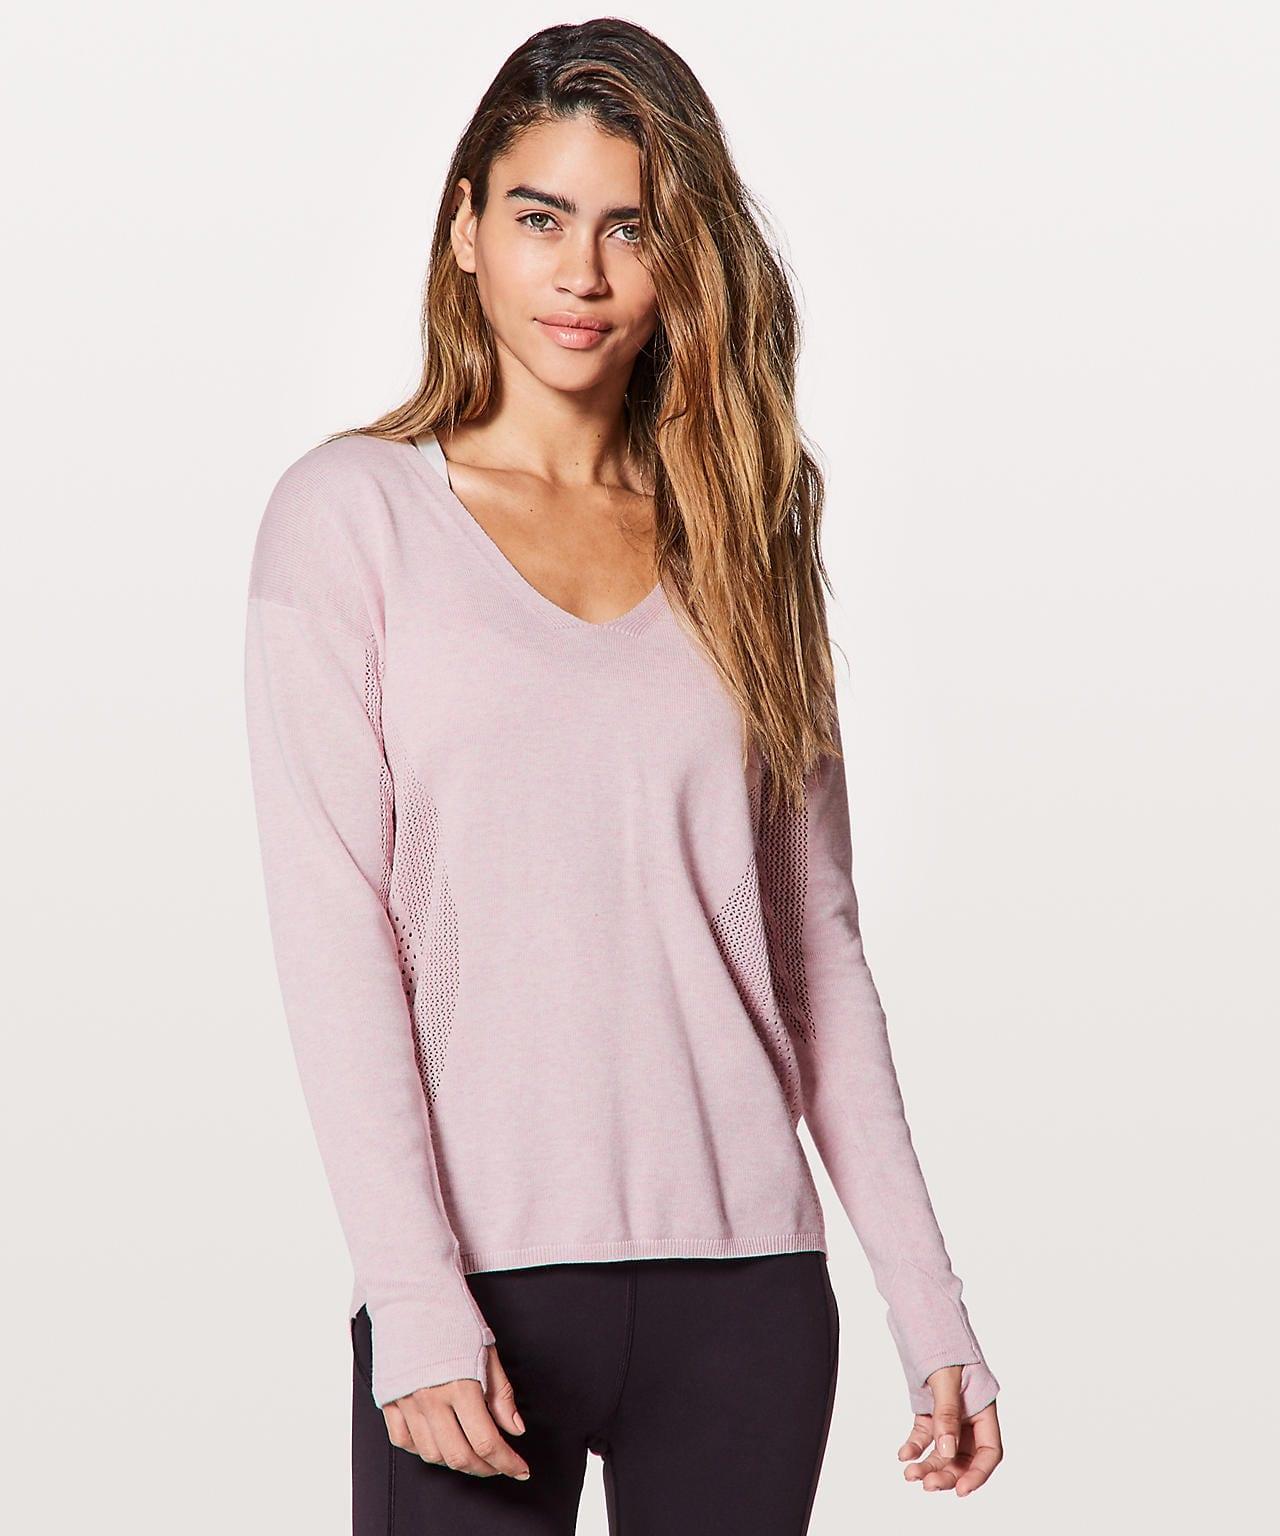 Lululemon Still Movement Sweater